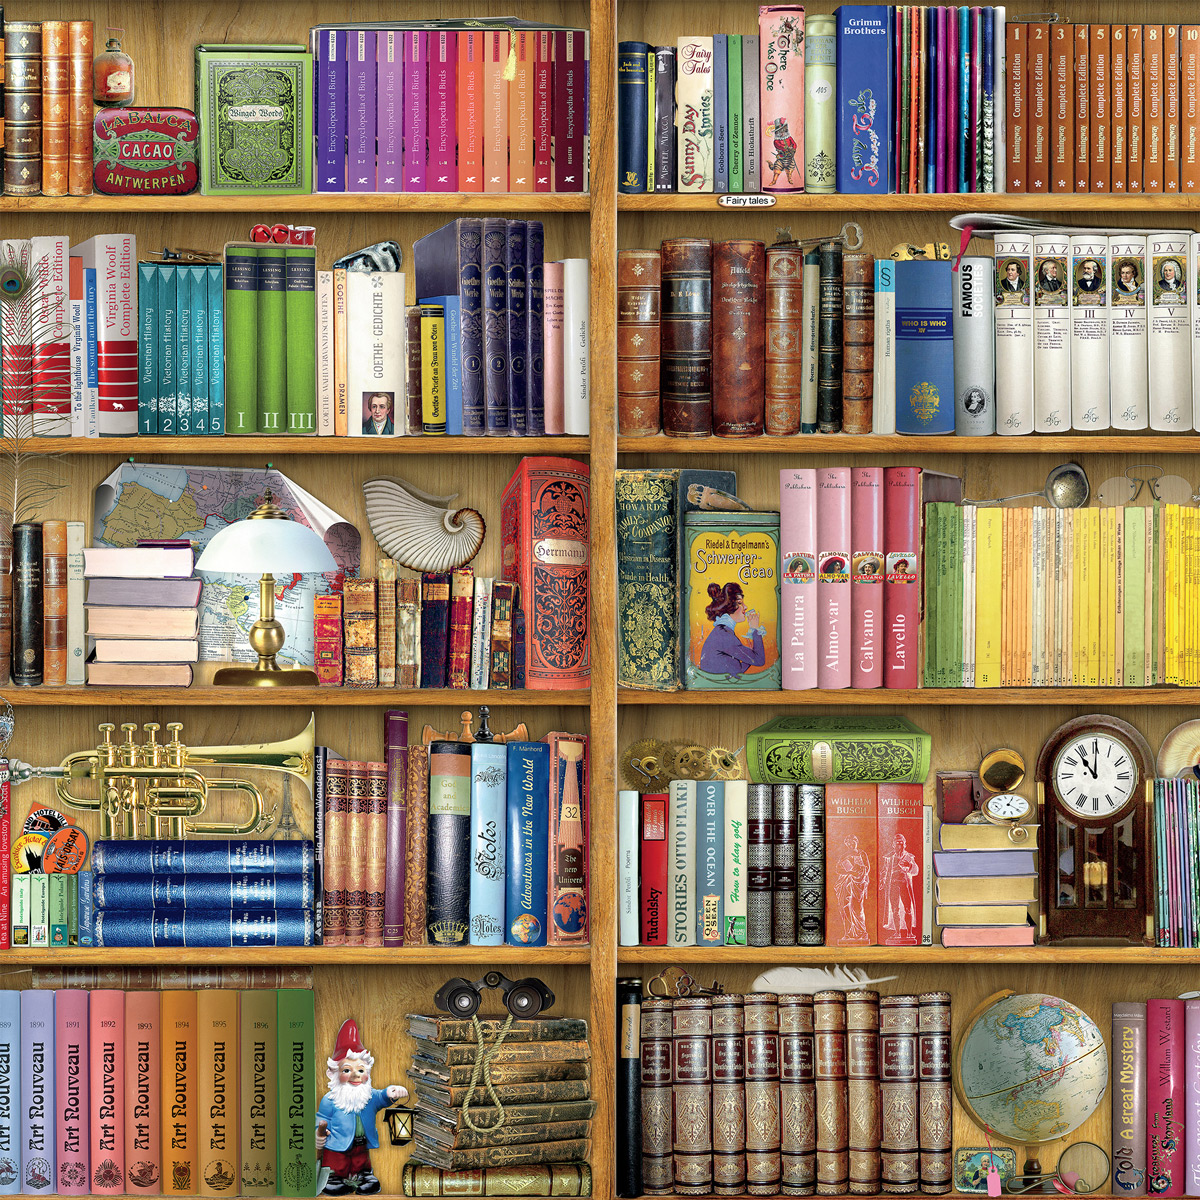 Library Shelf Bookshelves Jigsaw Puzzle